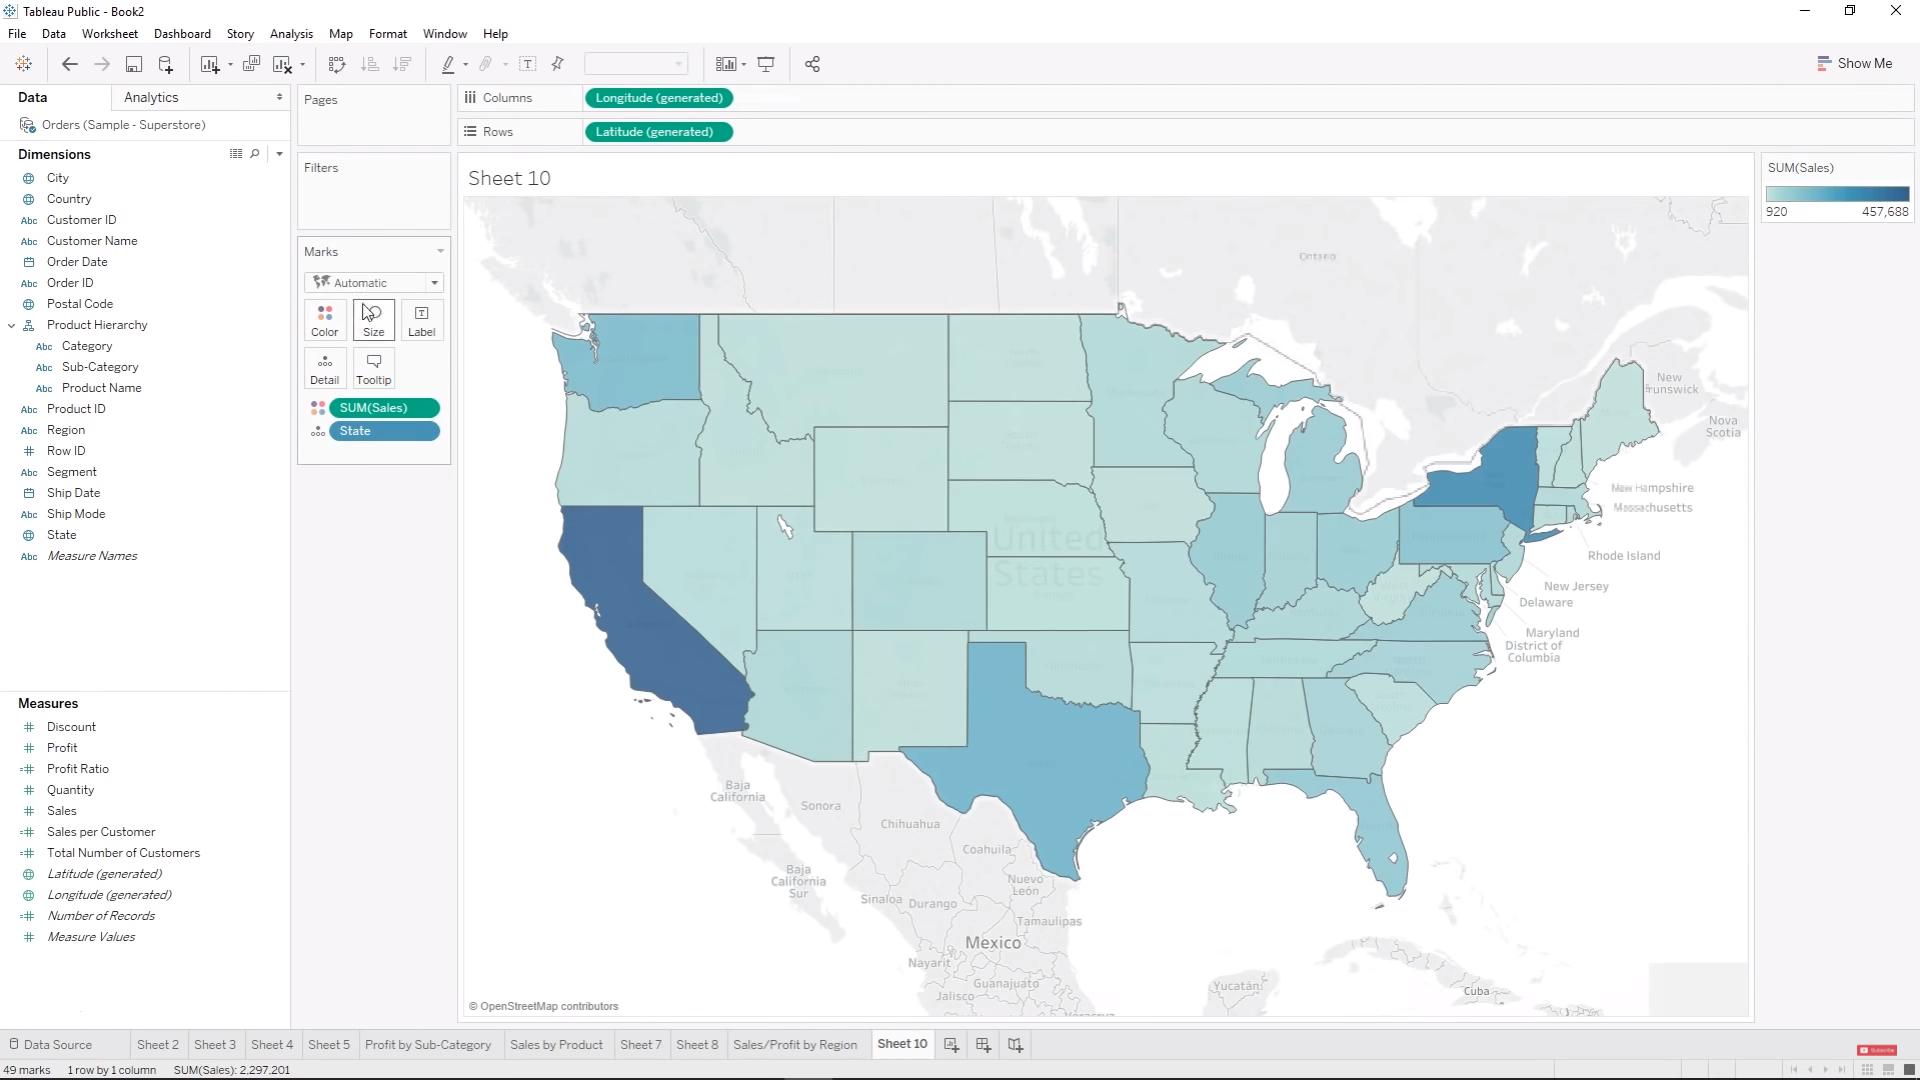 Применение аналитических карт в БА-системе Tableau Public